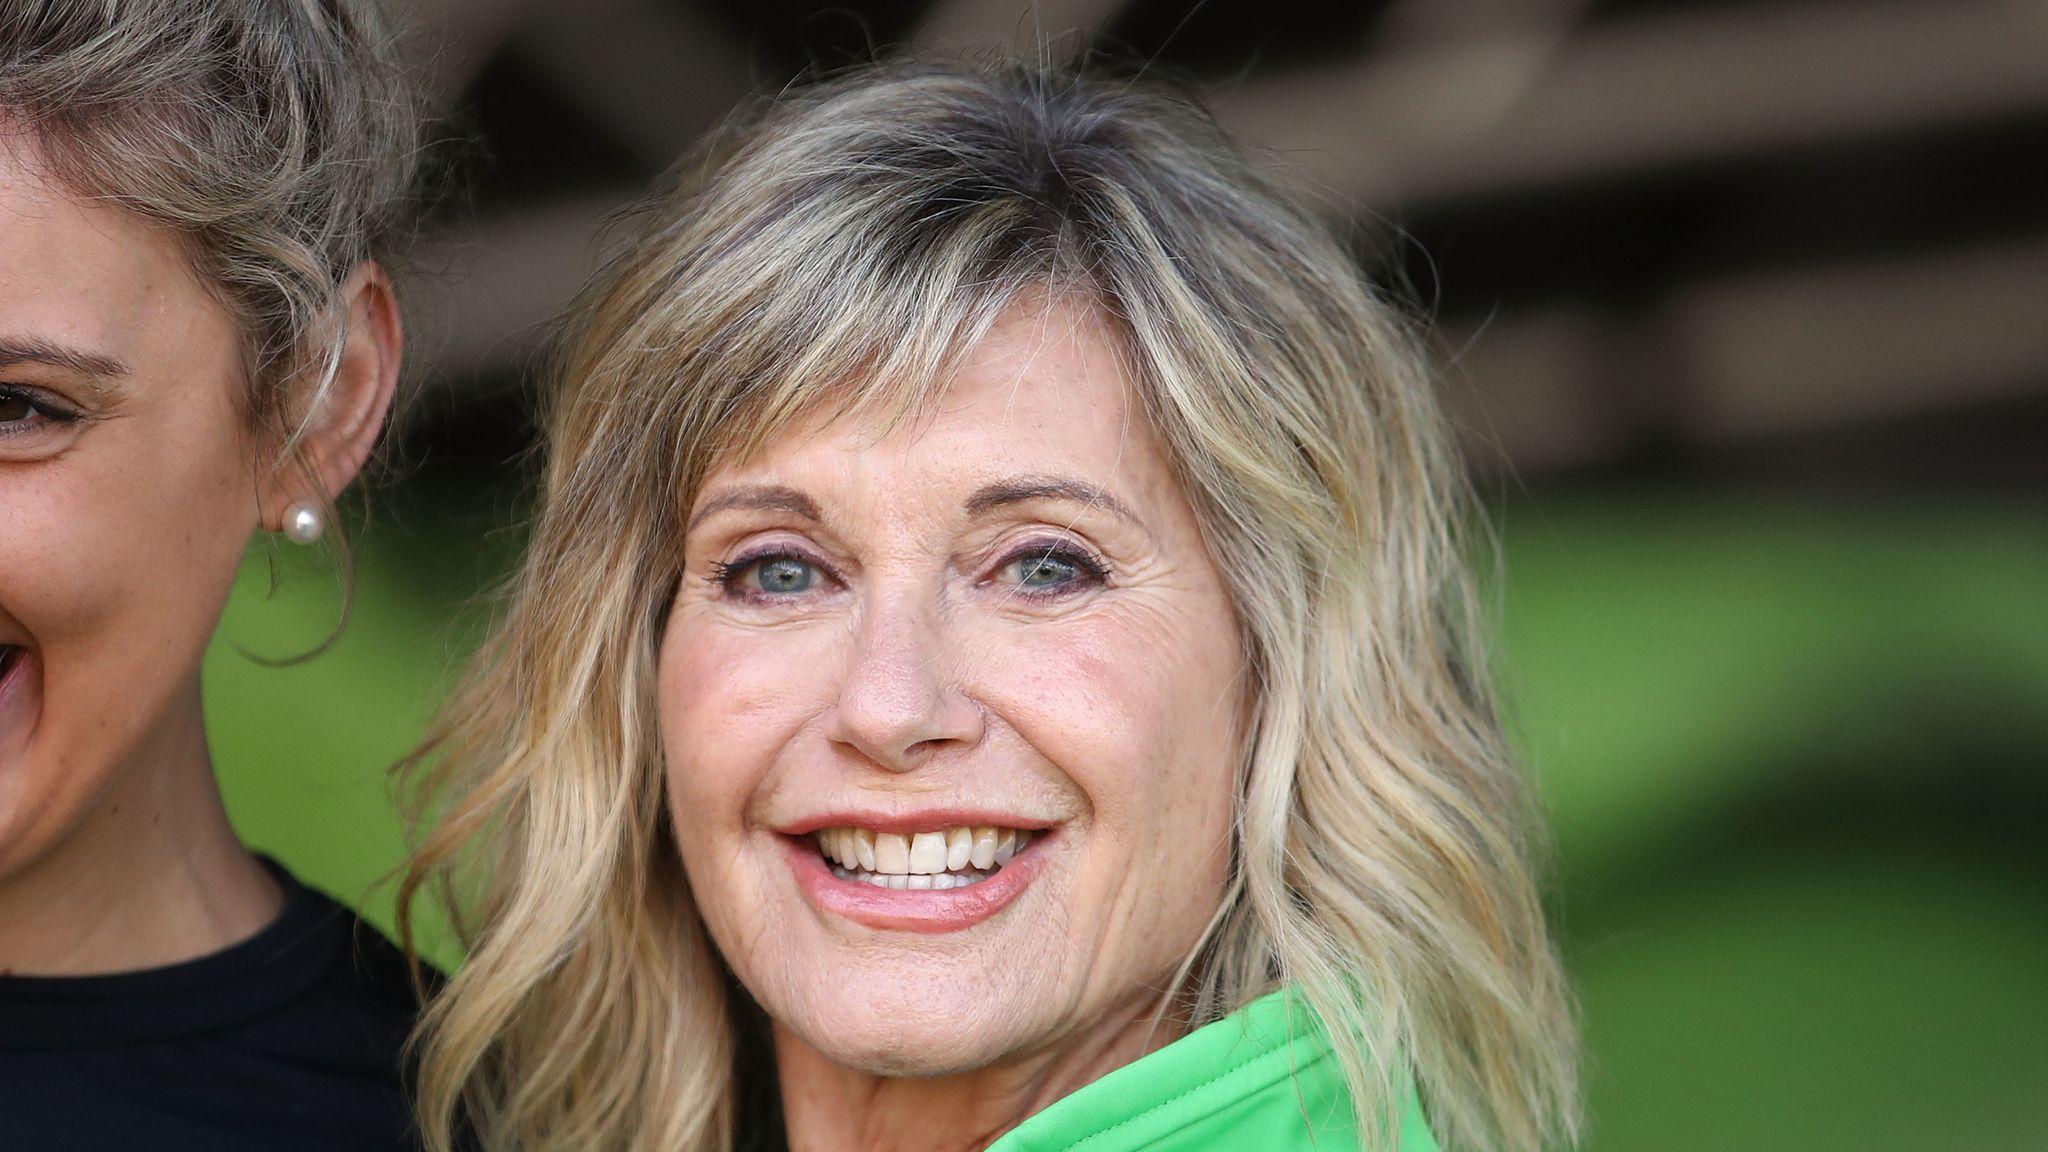 Olivia Newton John In Good Health Amid Rumours Shes Close